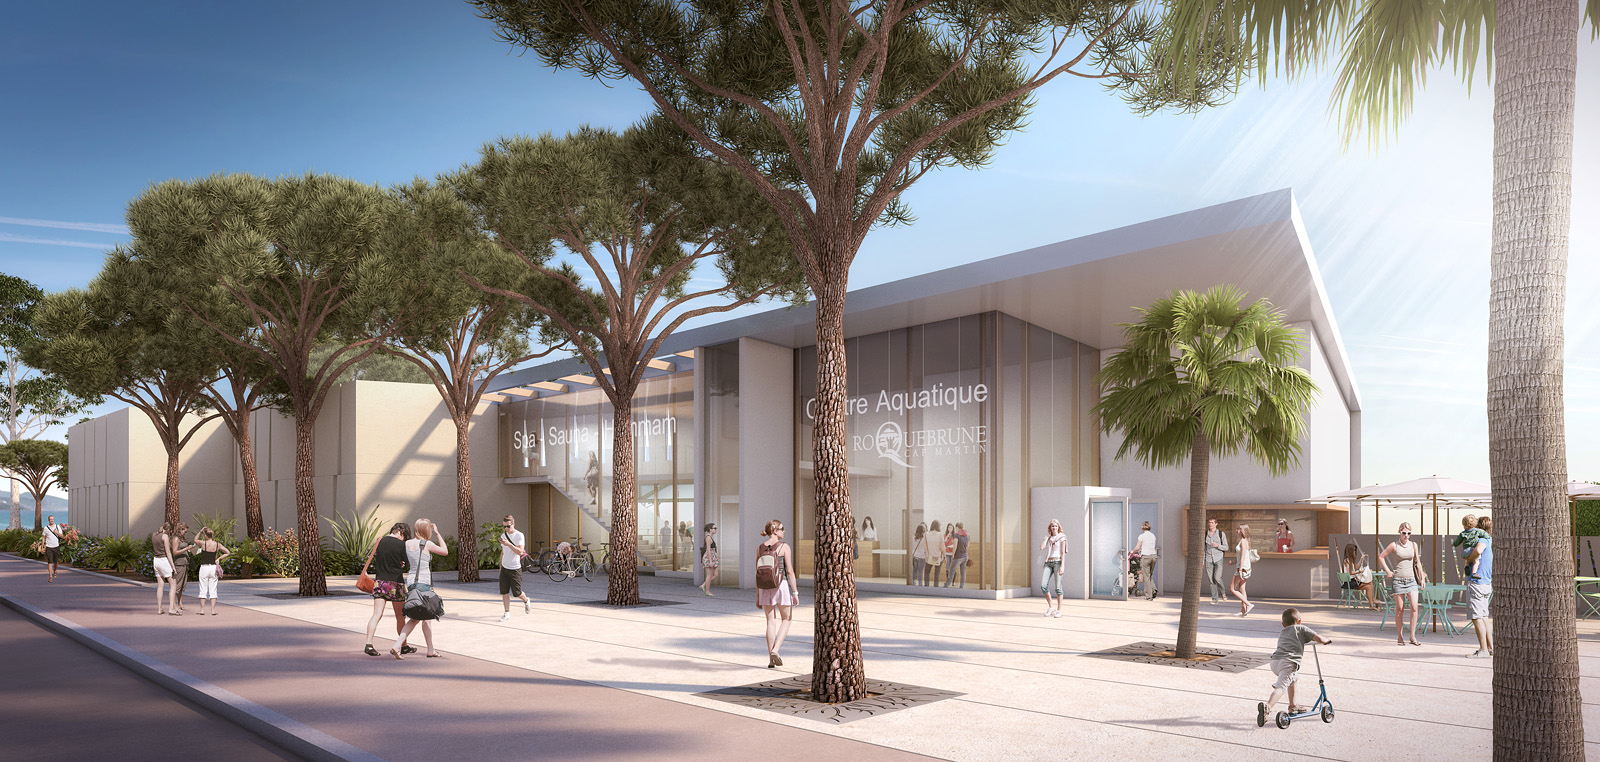 Nouvelle piscine municipale de Roquebrune-Cap-Martin